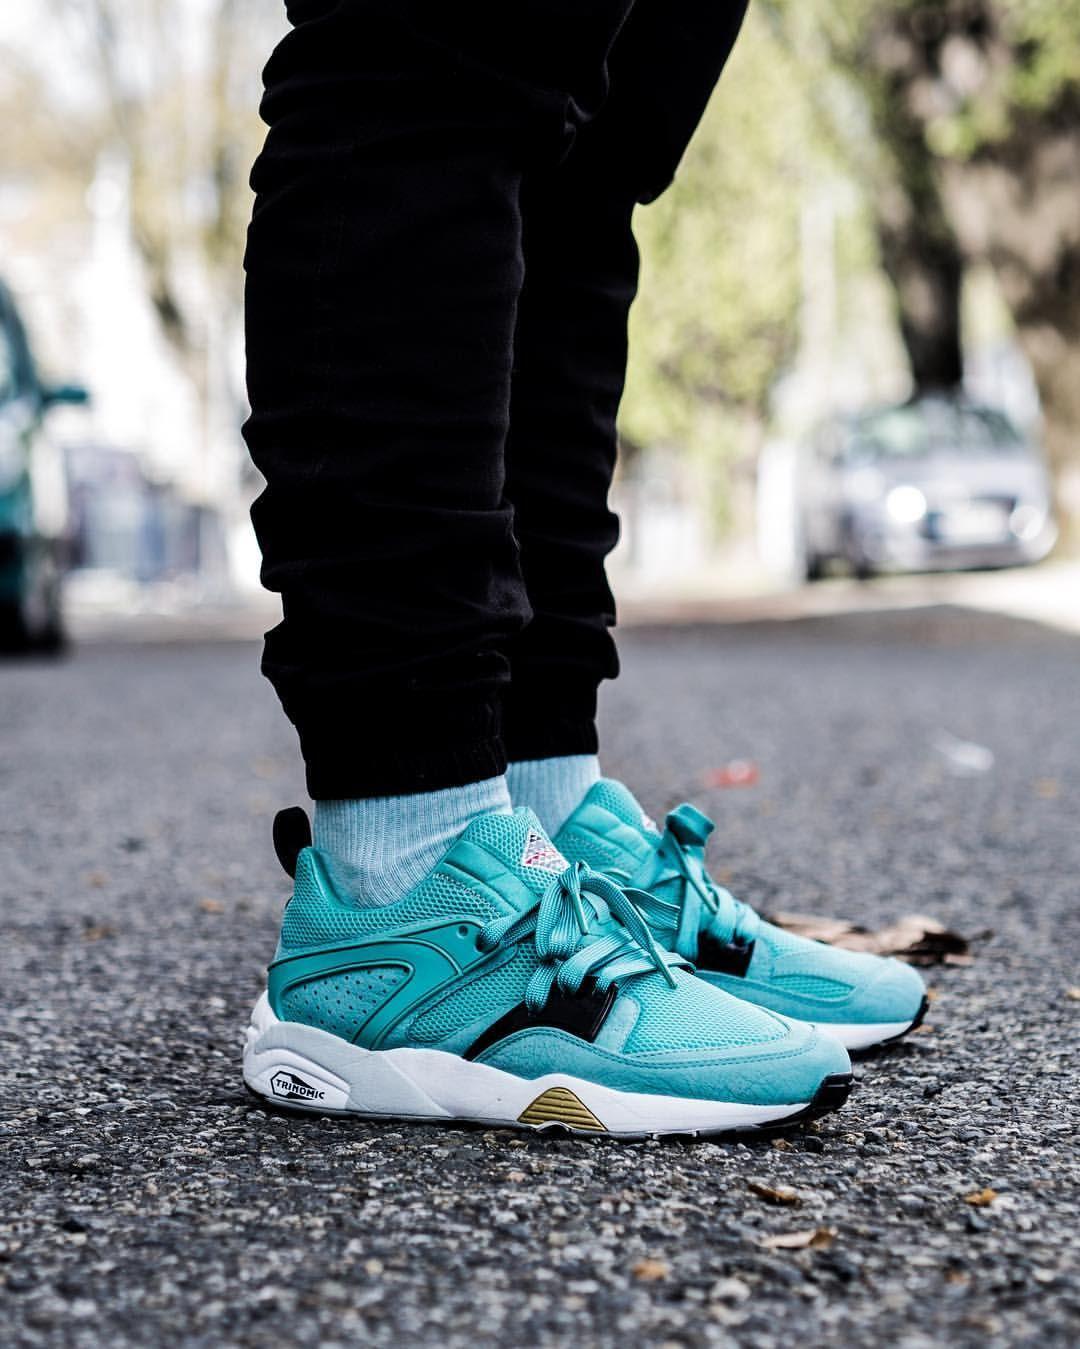 Sneakerfreaker x Puma Blaze Of Glory